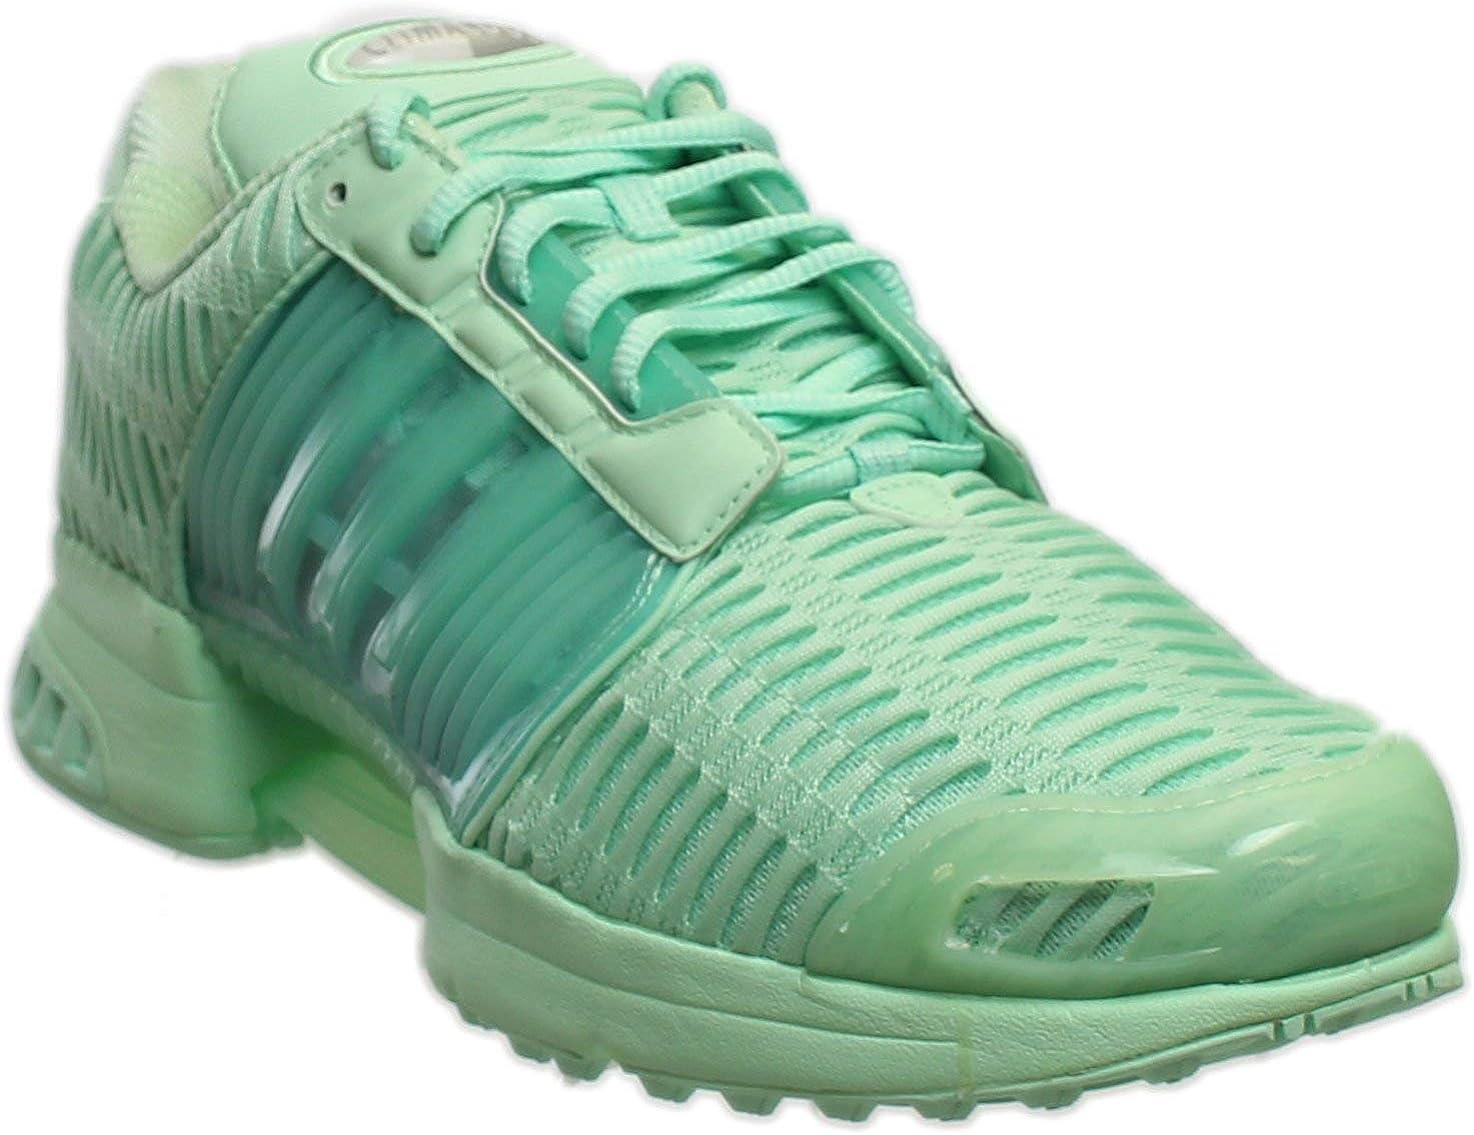 adidas Clima Cool 1 Men s Running Shoes Frozen Green bb0787